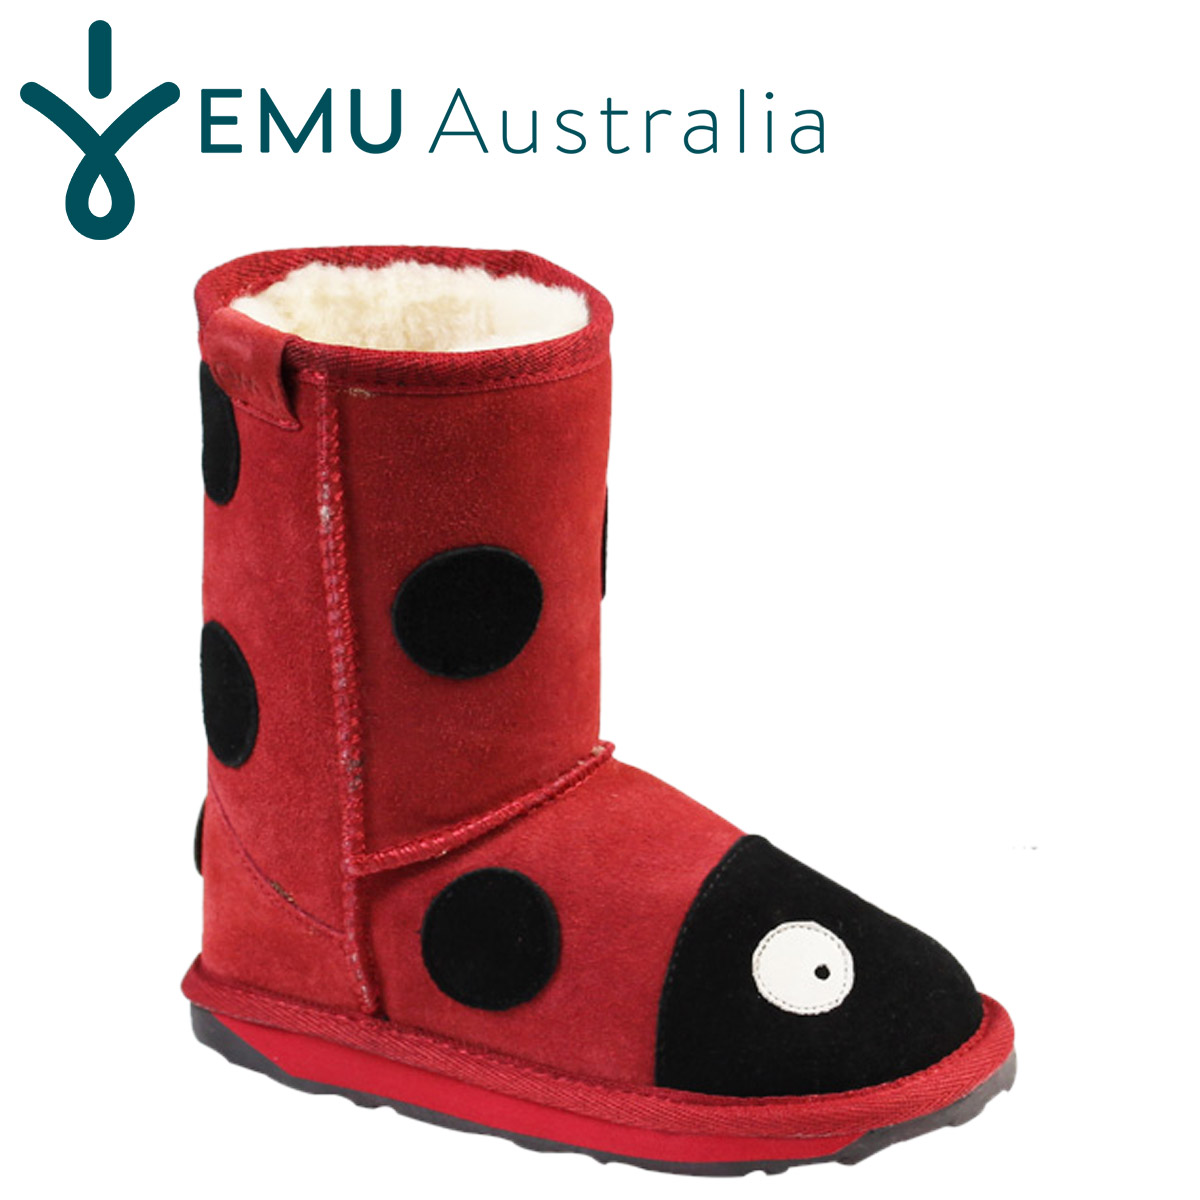 87157916ec6 LITTLE CREATURES LADY BUG Sheepskin kids ' boots EMU EMU yachts Ladybug  Sheepskin boots [Red] K10111 [regular]